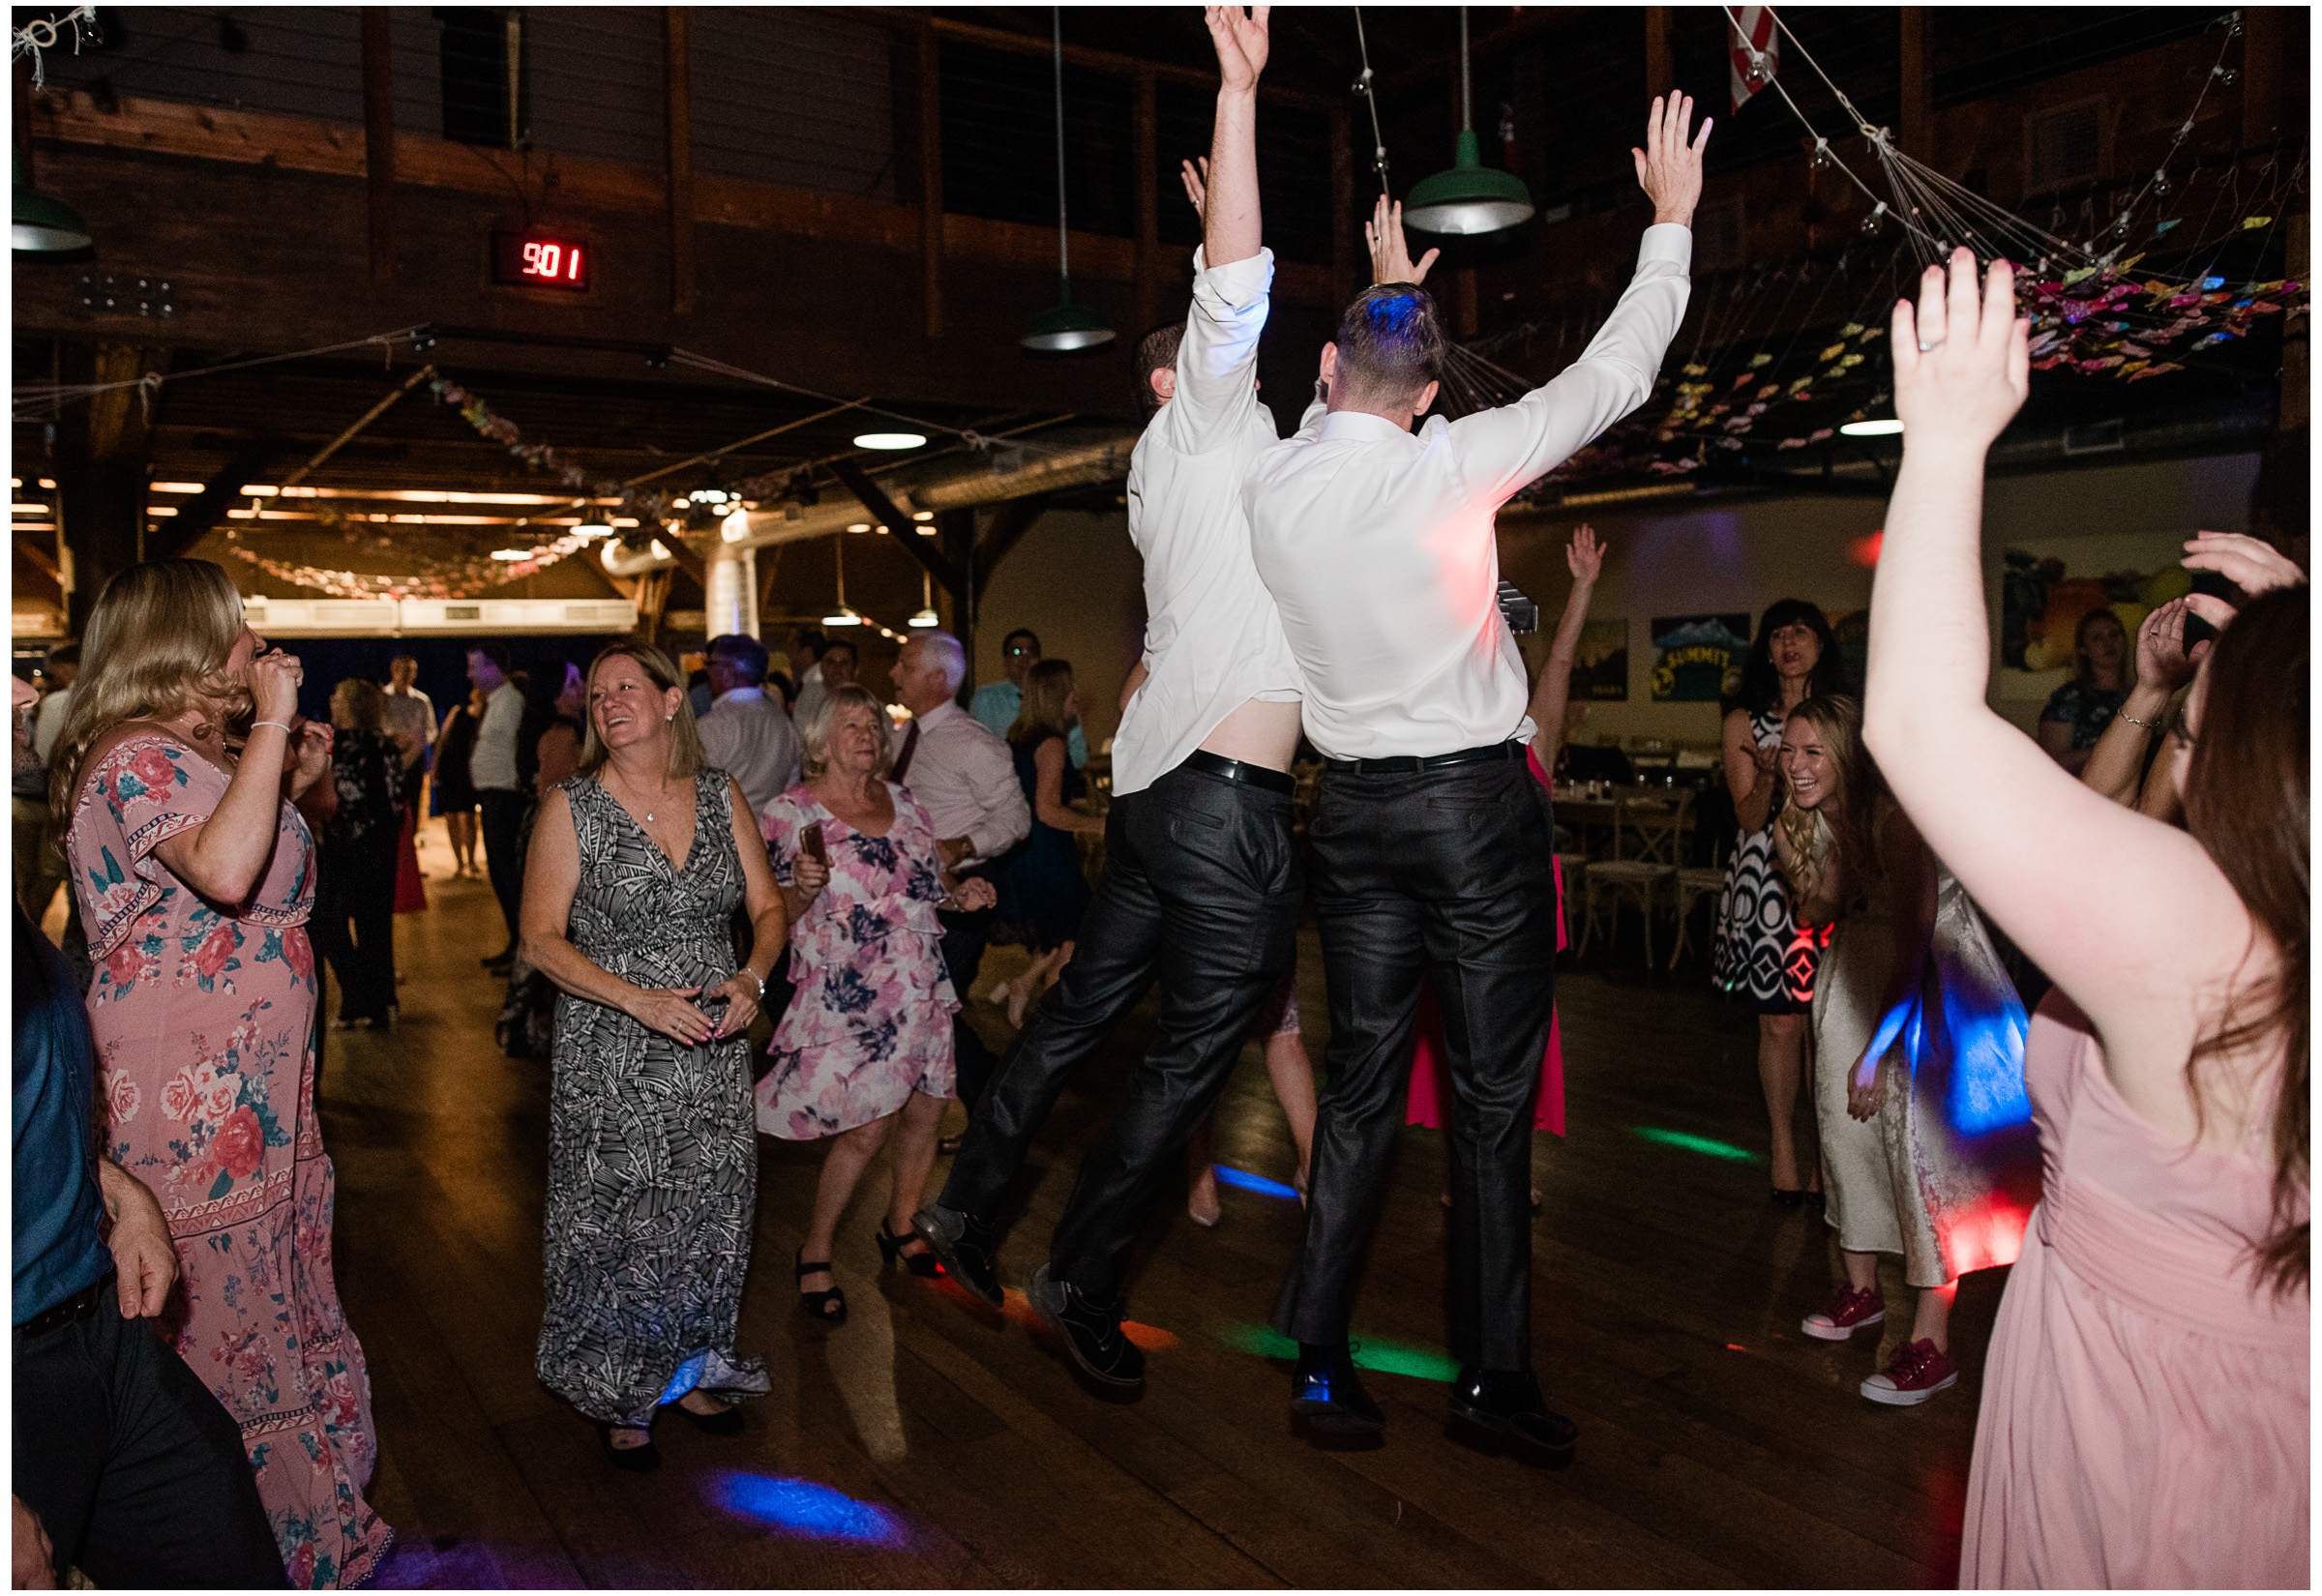 Loomis Wedding - Sacramento Photographer - Blue Goose - Justin Wilcox Photography - 22.jpg